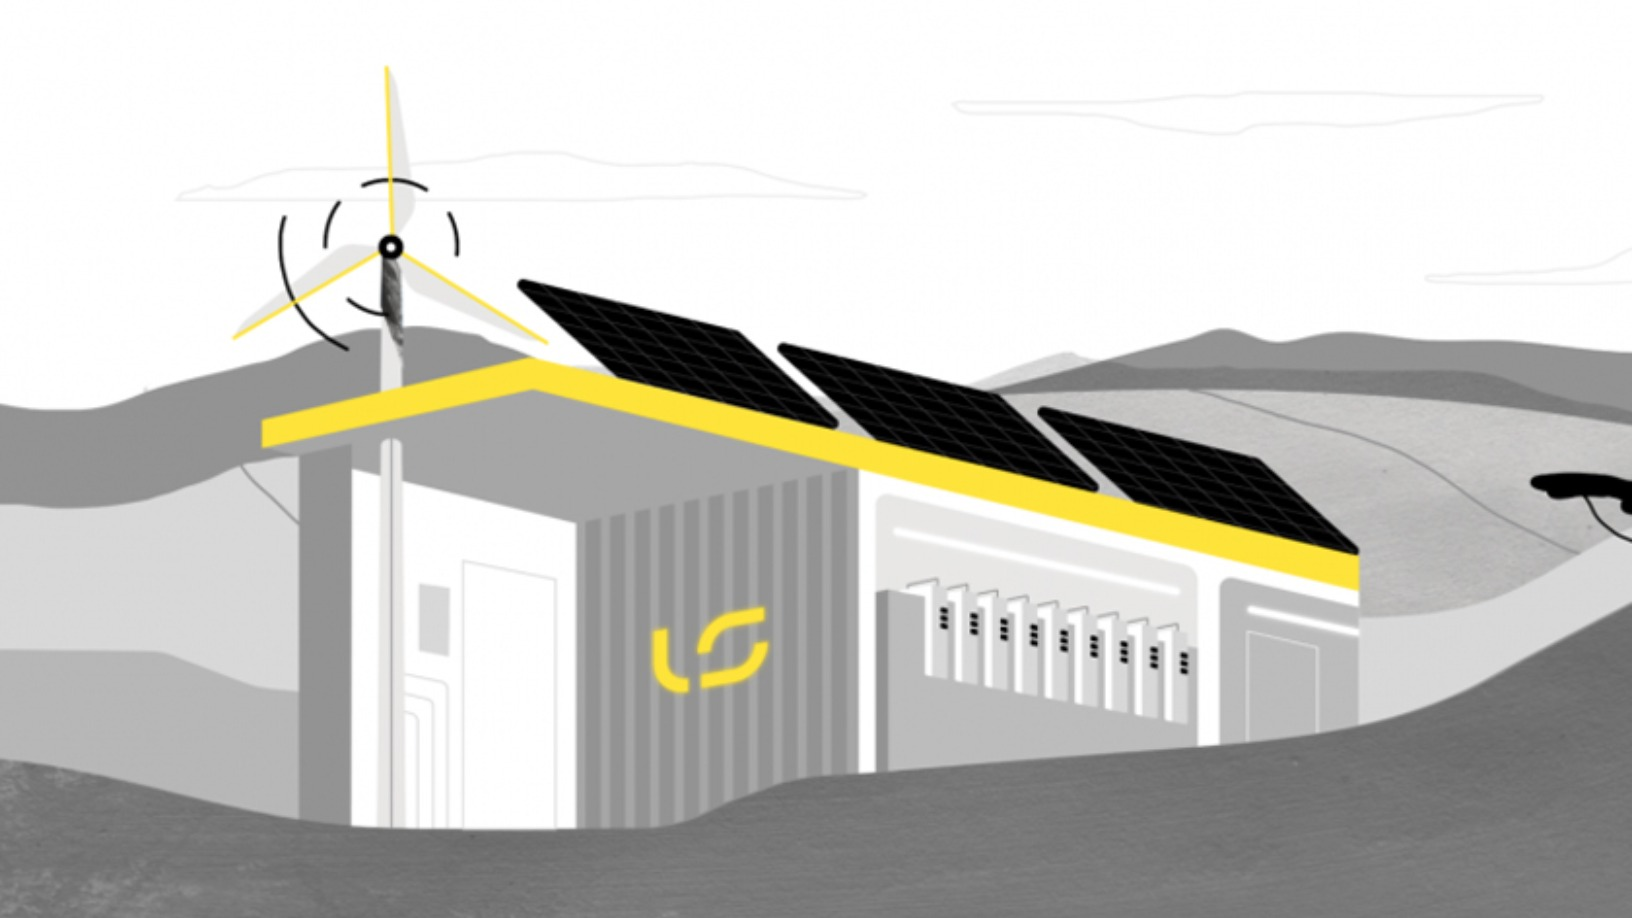 Liquidstar: Bringing decentralized renewable energy to off-grid communities